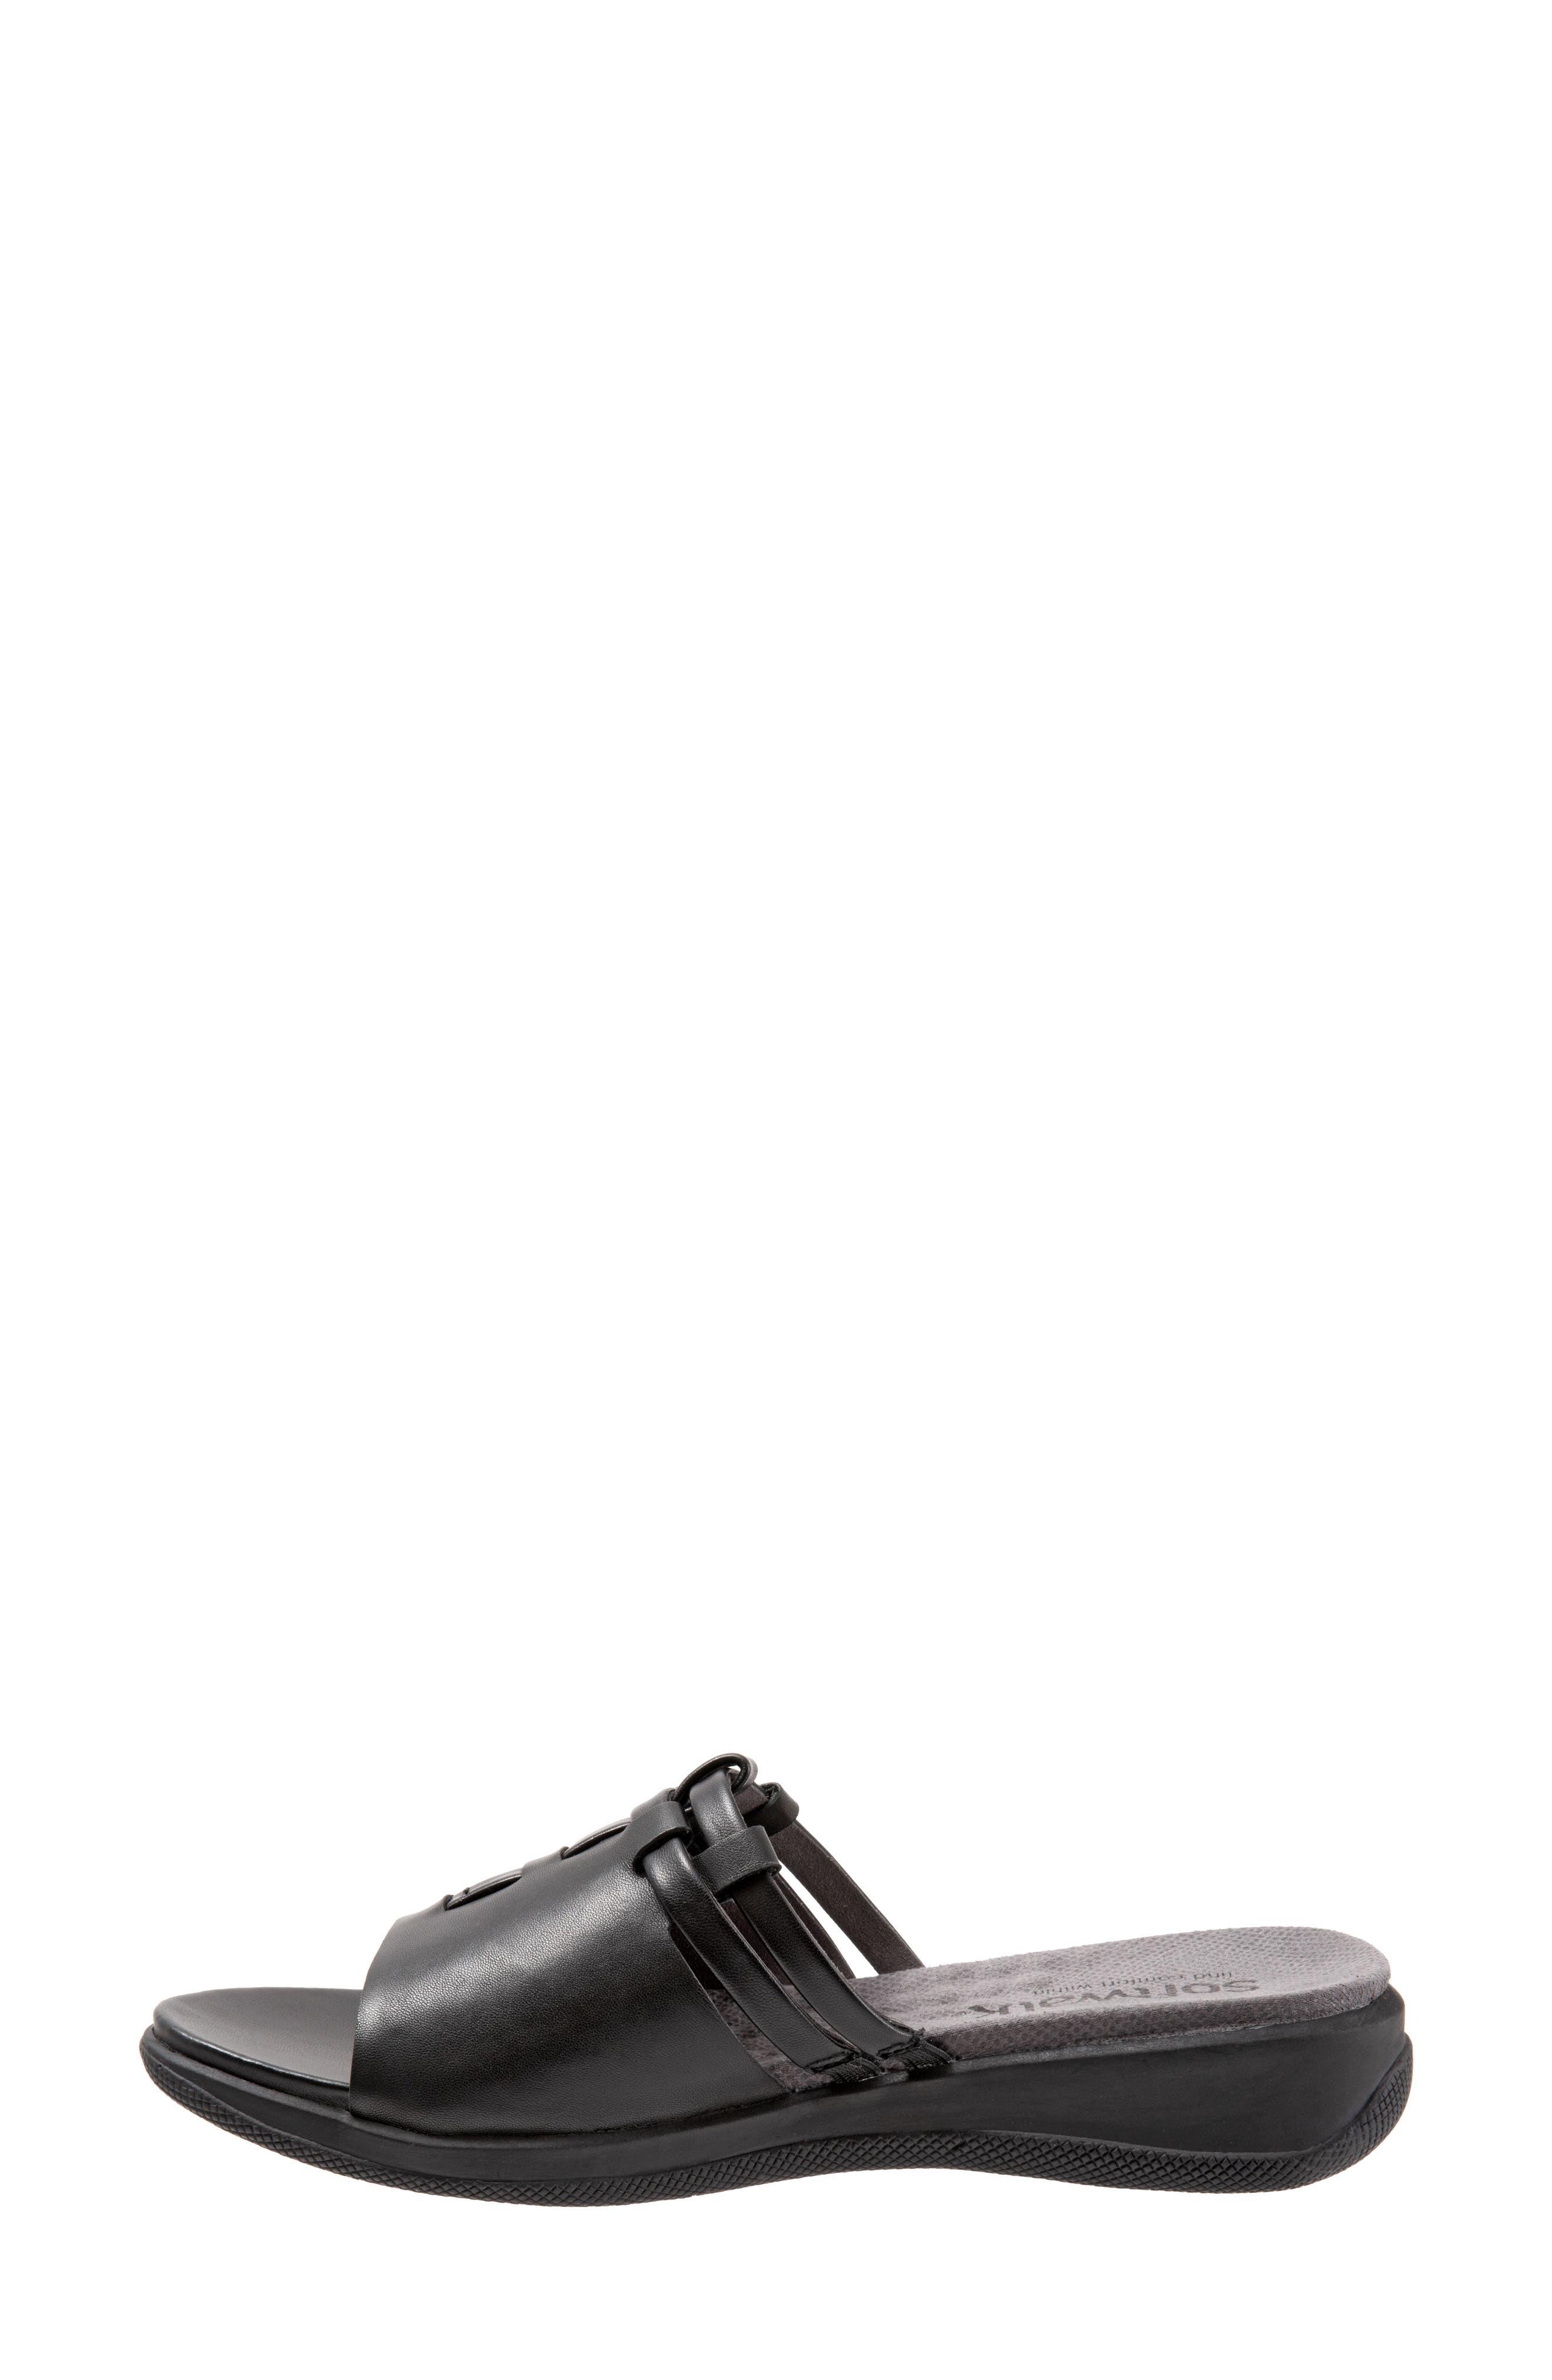 SOFTWALK<SUP>®</SUP>, Tahoma Woven Slide Sandal, Alternate thumbnail 8, color, BLACK LEATHER